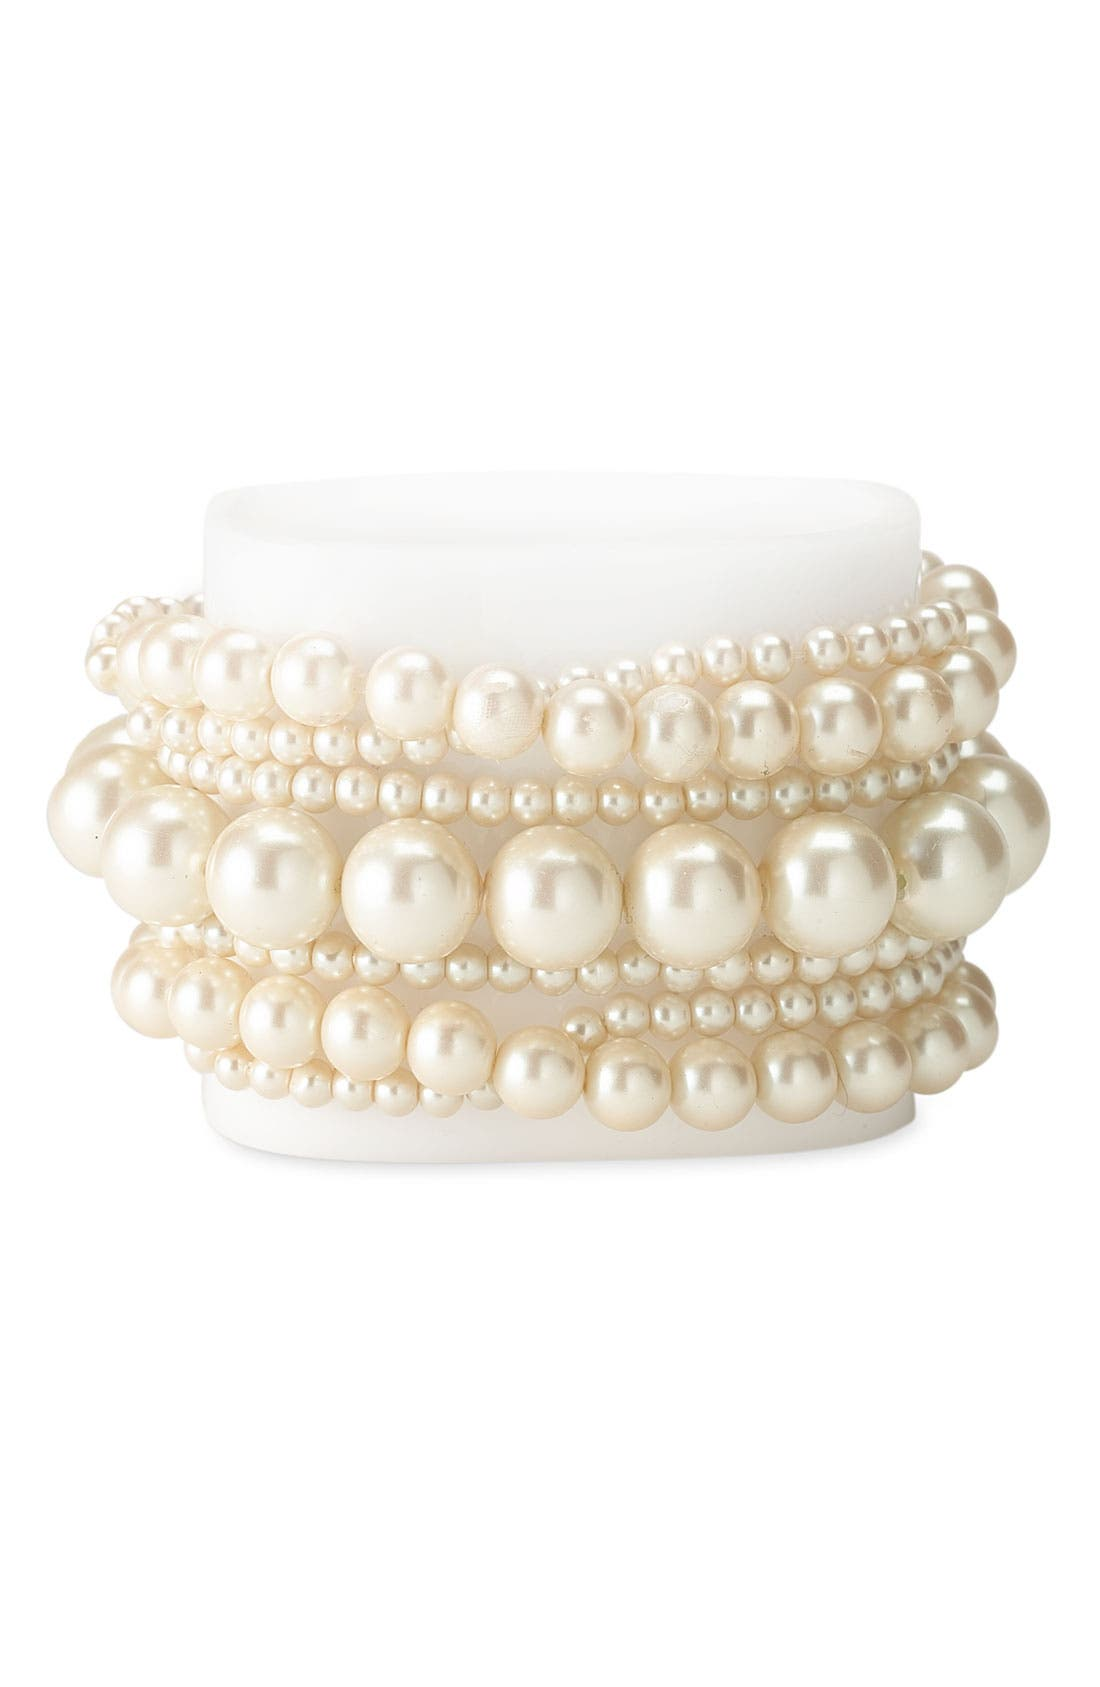 Alternate Image 1 Selected - Nordstrom Glass Stretch Pearl Bracelet